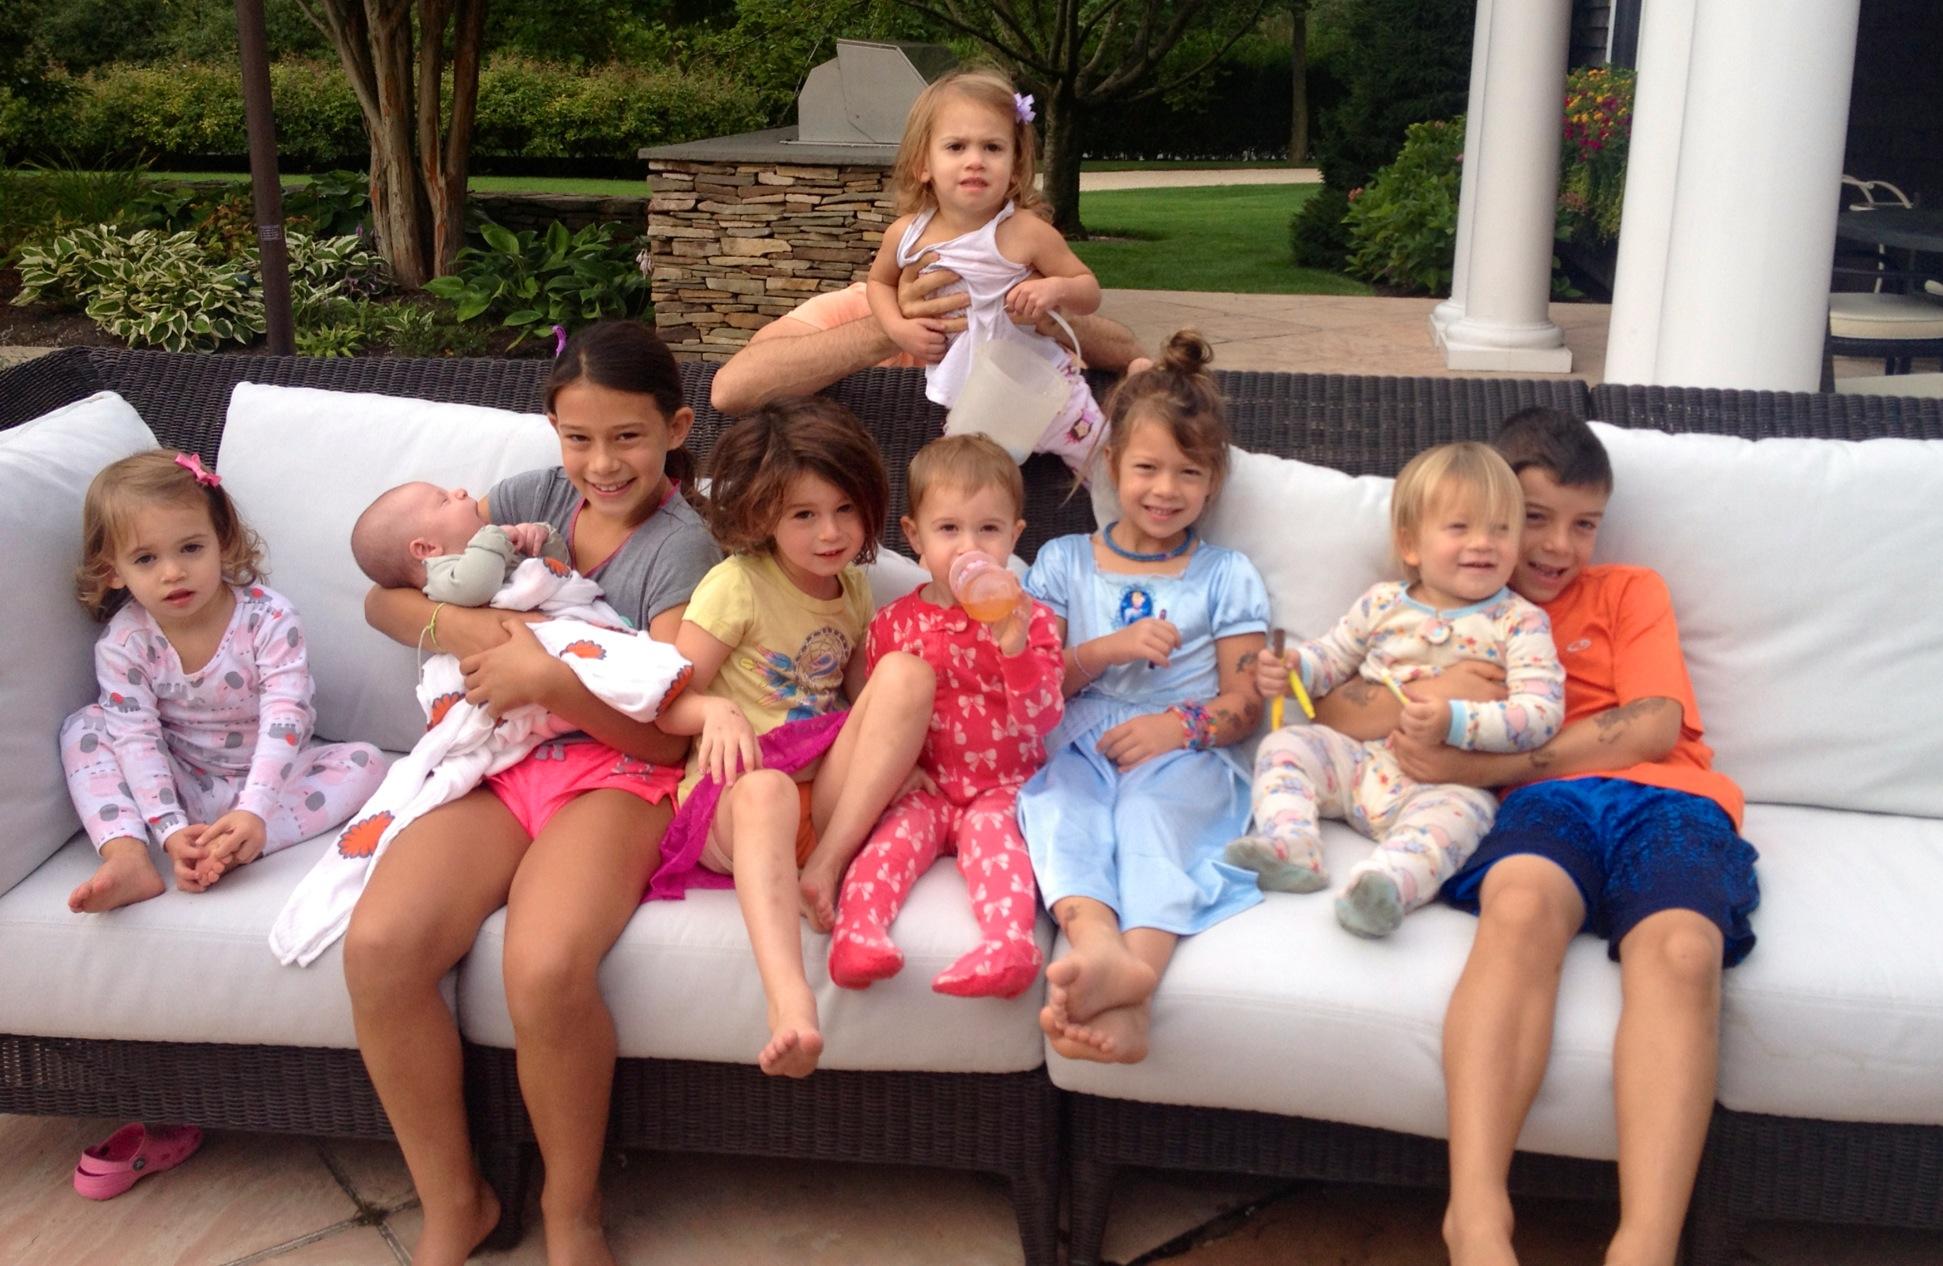 The Littles Kessners